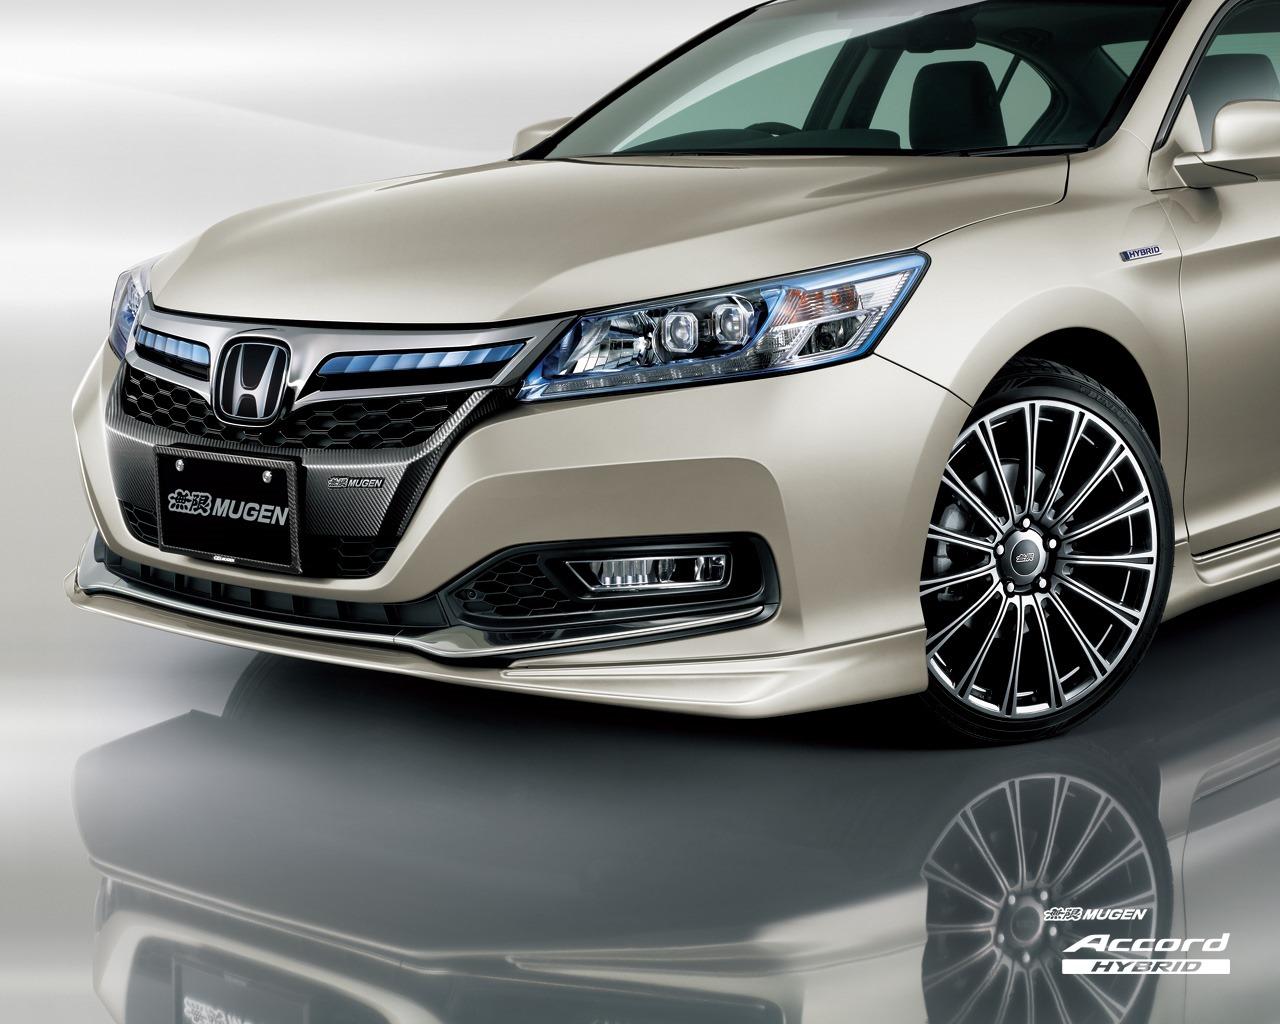 Honda Accord Hybrid โฉมใหม่ แต่งโดย Mugen รถใหม่ 2018